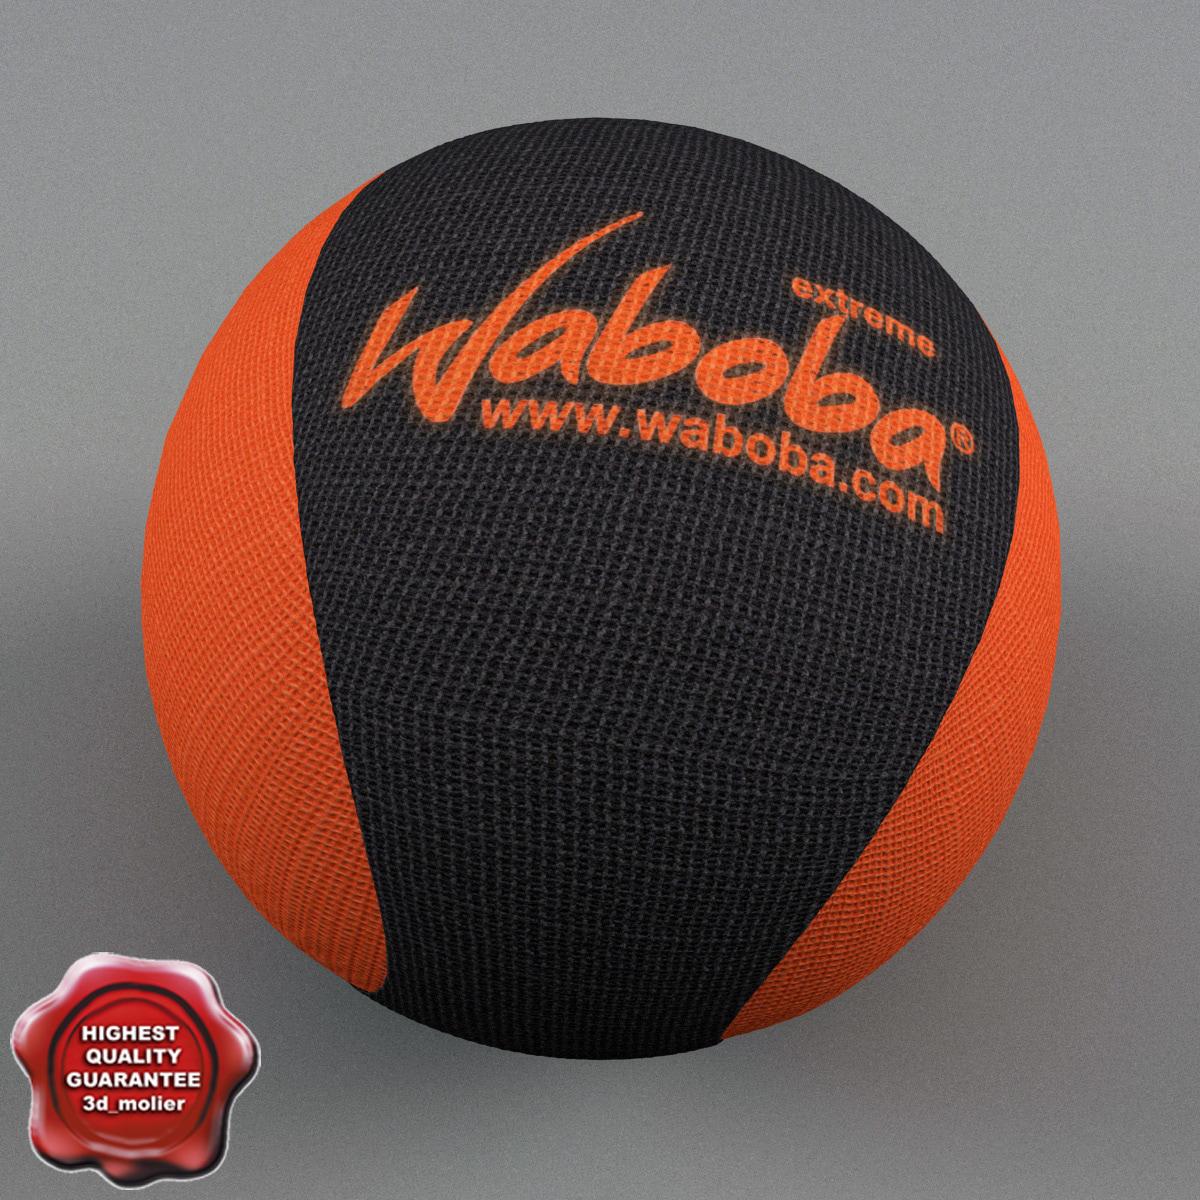 Waboba_Tennis_Ball_00.jpg